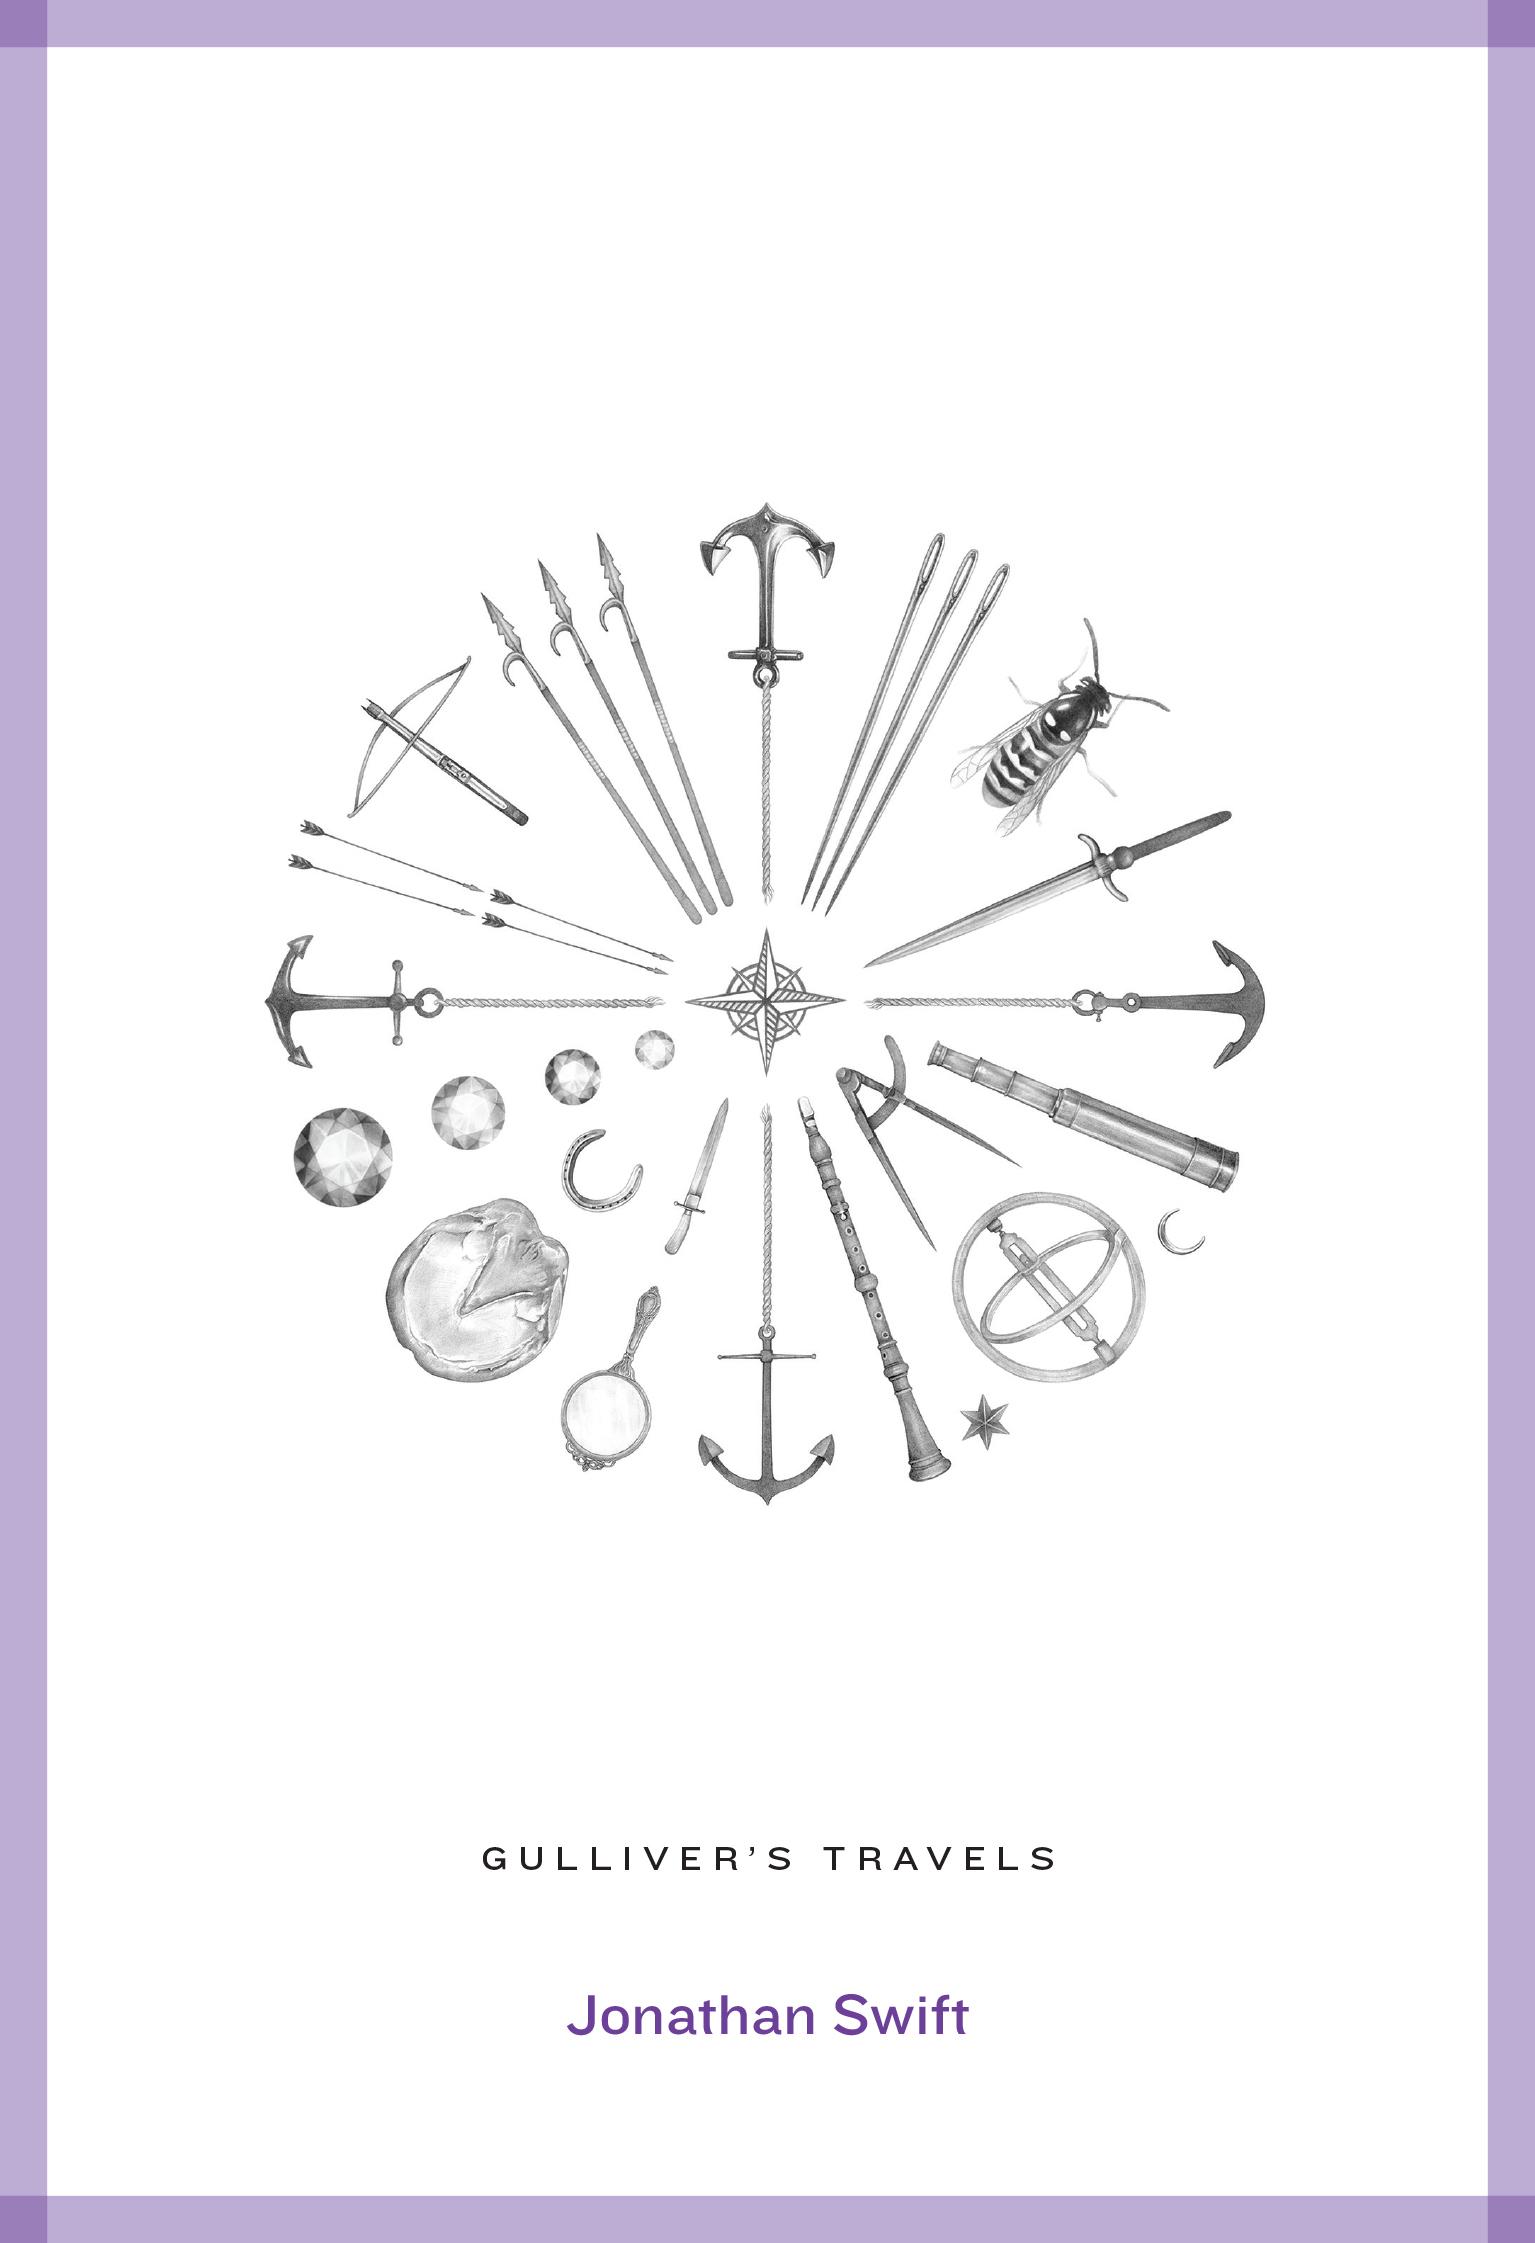 9781909399563 Gullivers Travels.jpg